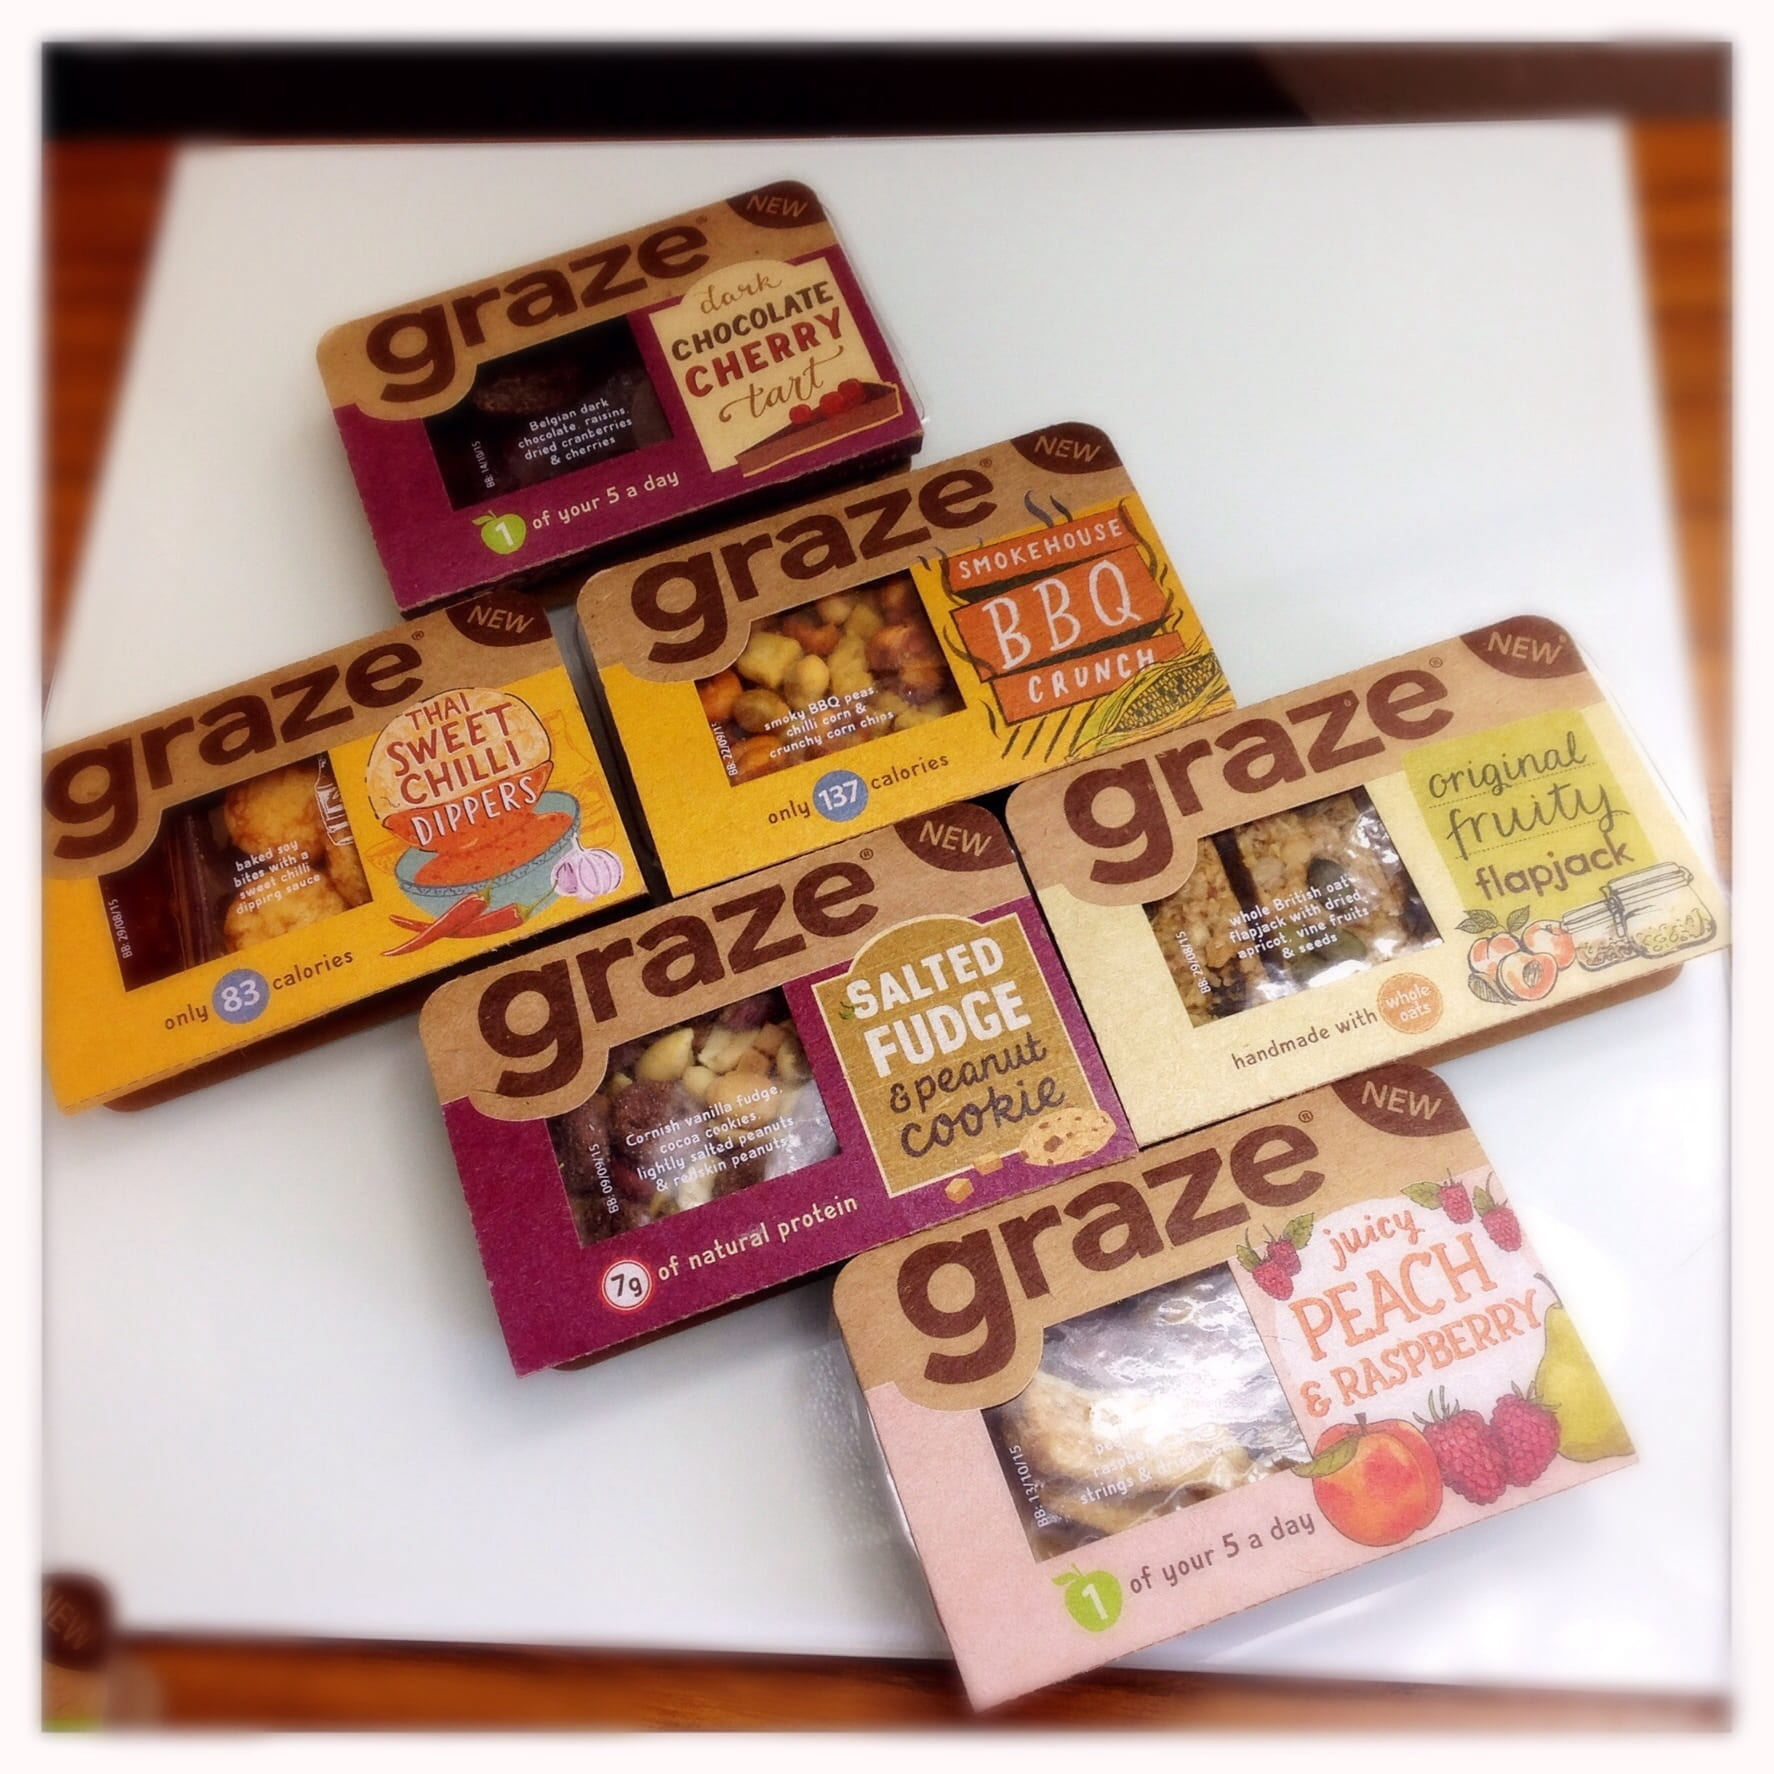 Graze good to go range snacks